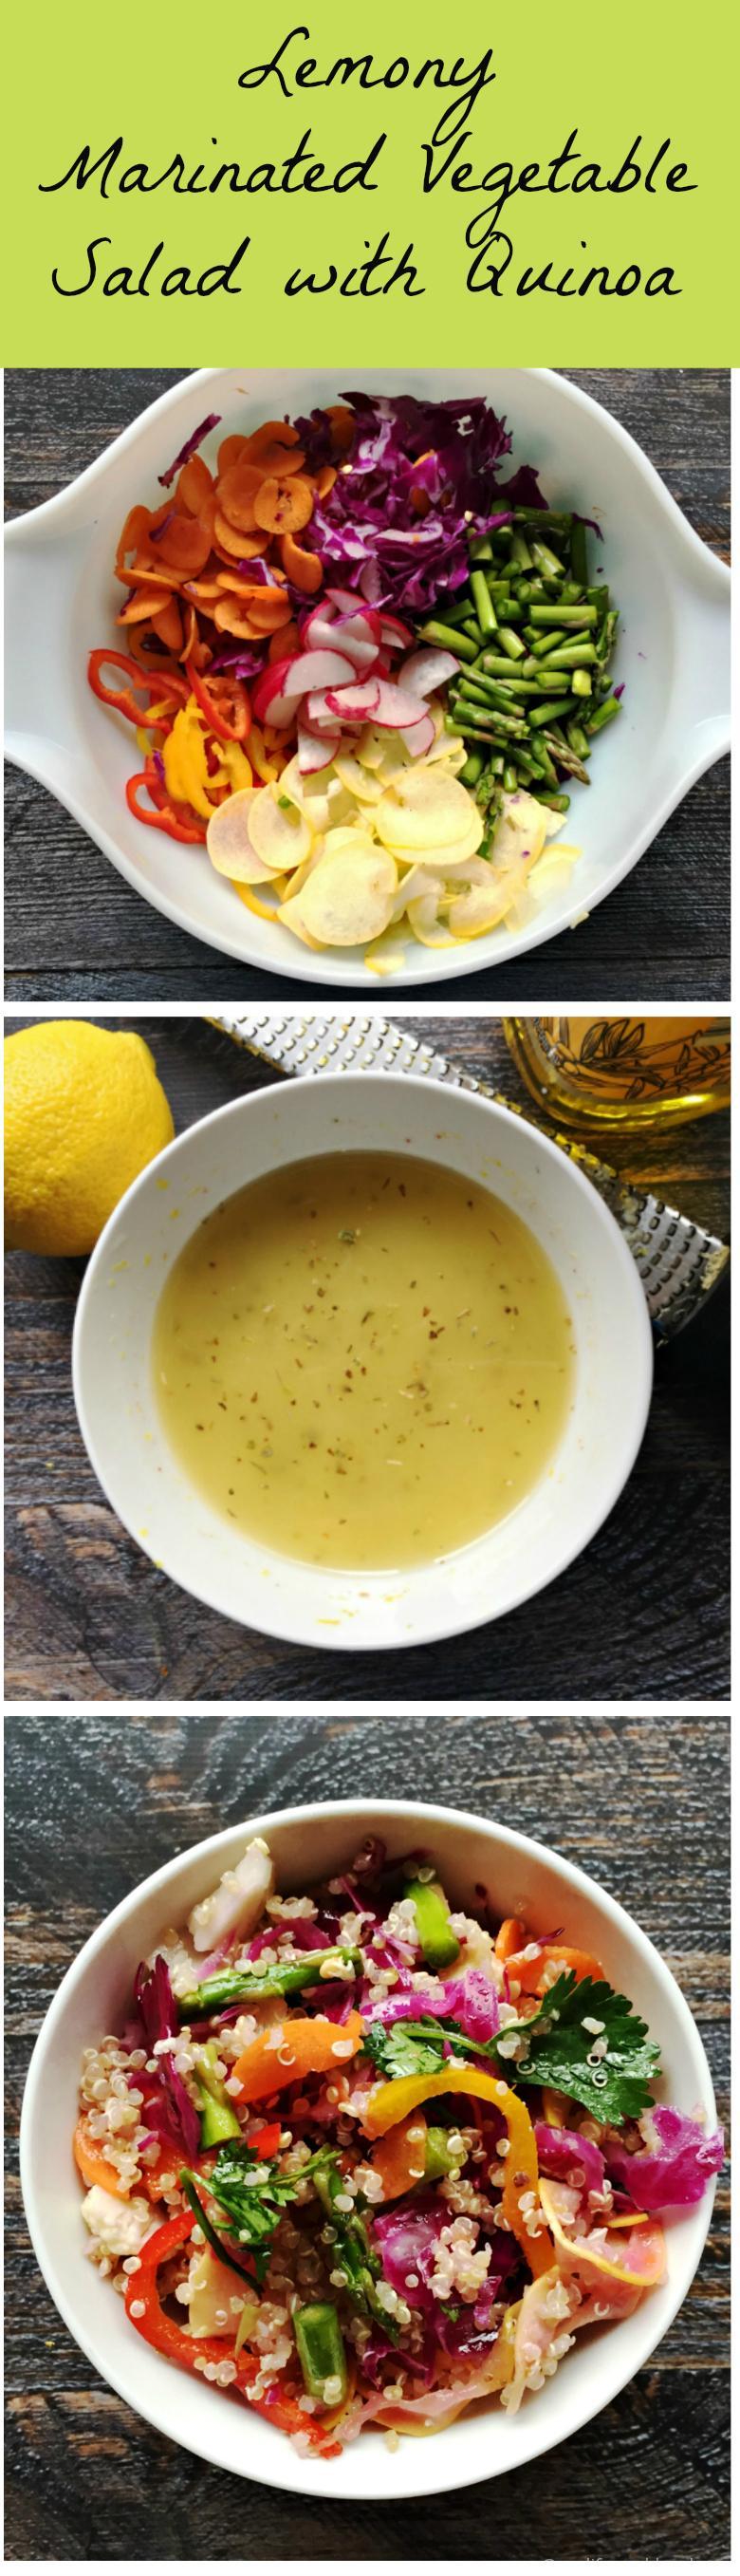 Lemon Marinated Veggie Salad with Quinoa